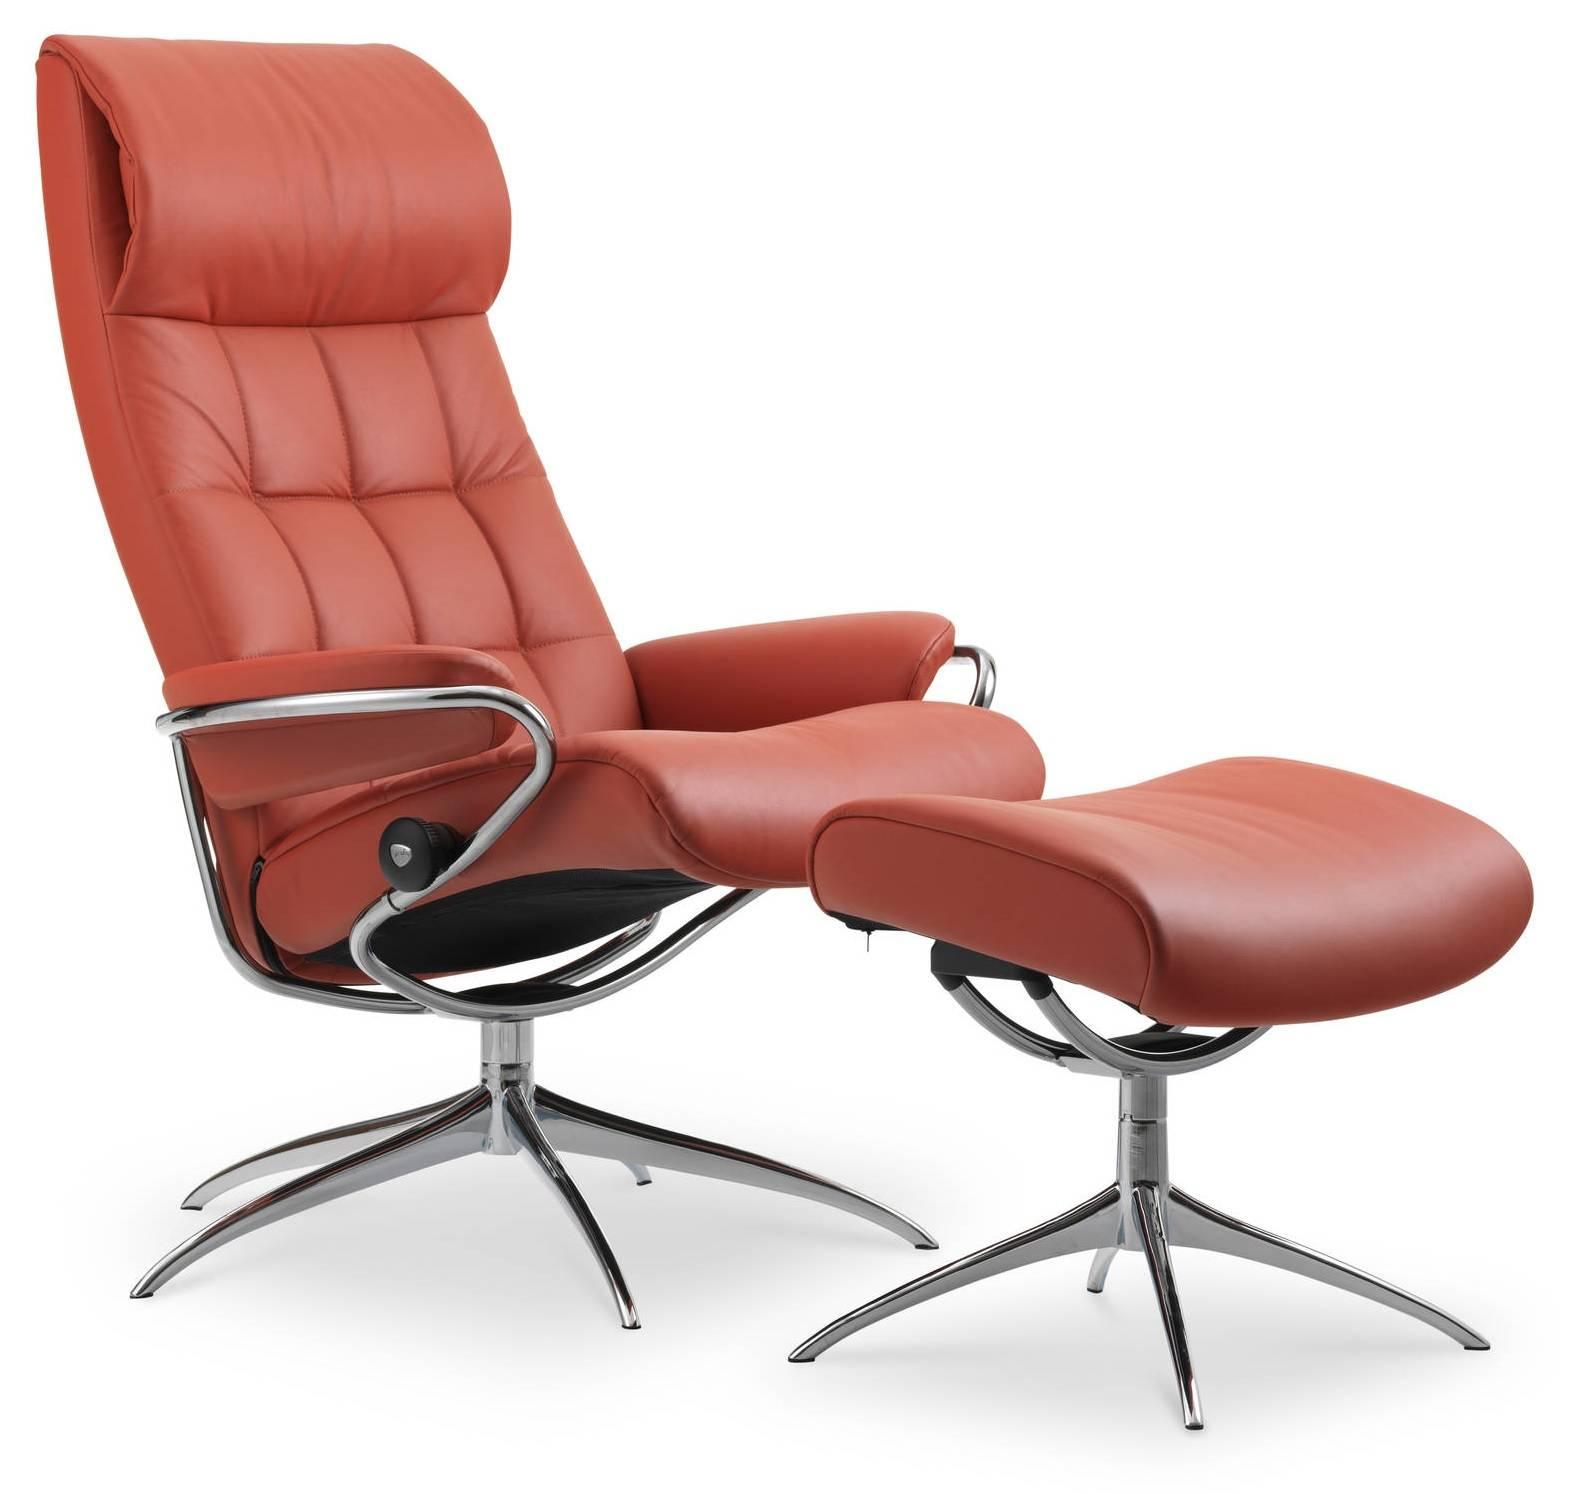 Excellent Stressless London High Back Star High Base Chair Stool Alphanode Cool Chair Designs And Ideas Alphanodeonline